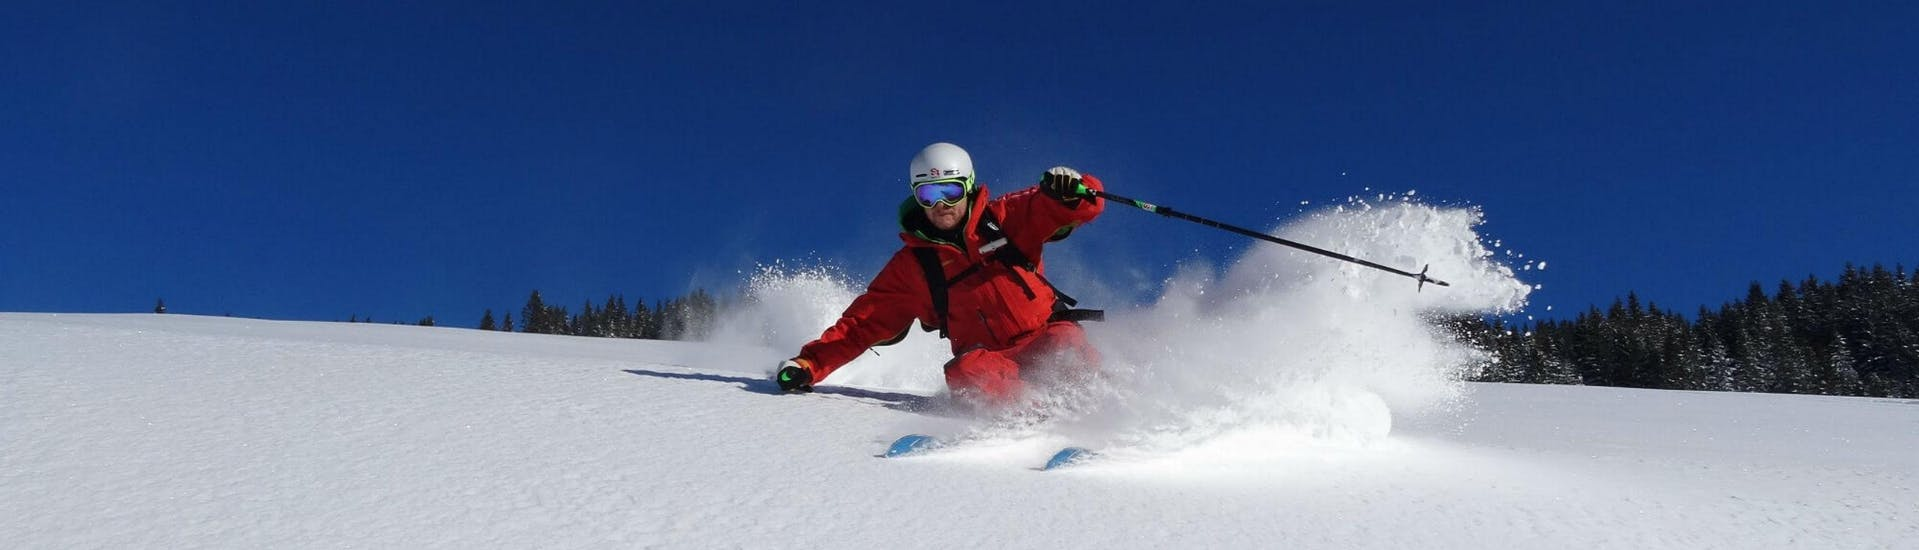 A ski instructor from the ski school S4 Snowsport Fieberbrunn is skiing through deep powder snow in the tyrolean ski resort of Fieberbrunn.